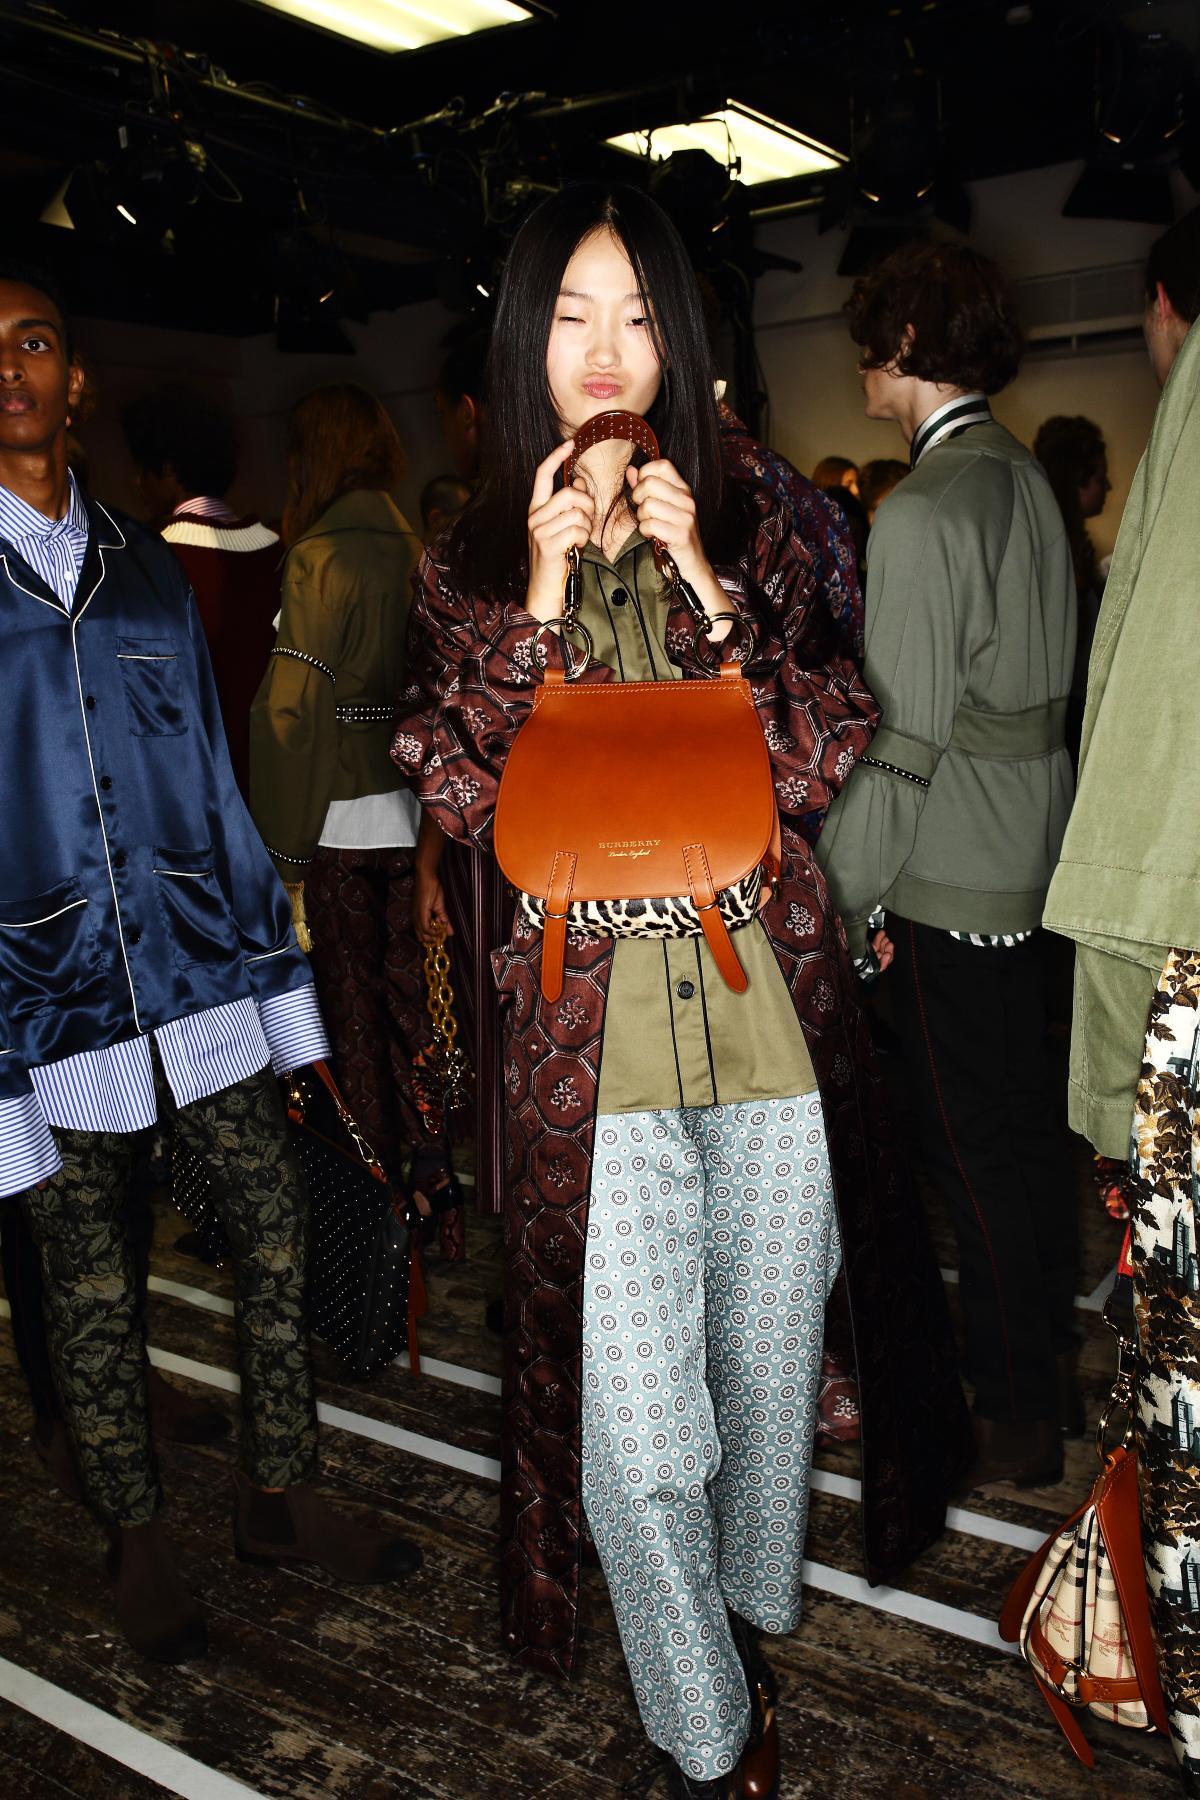 Burberry Fall 16 ready to wear fashion show London Backstage